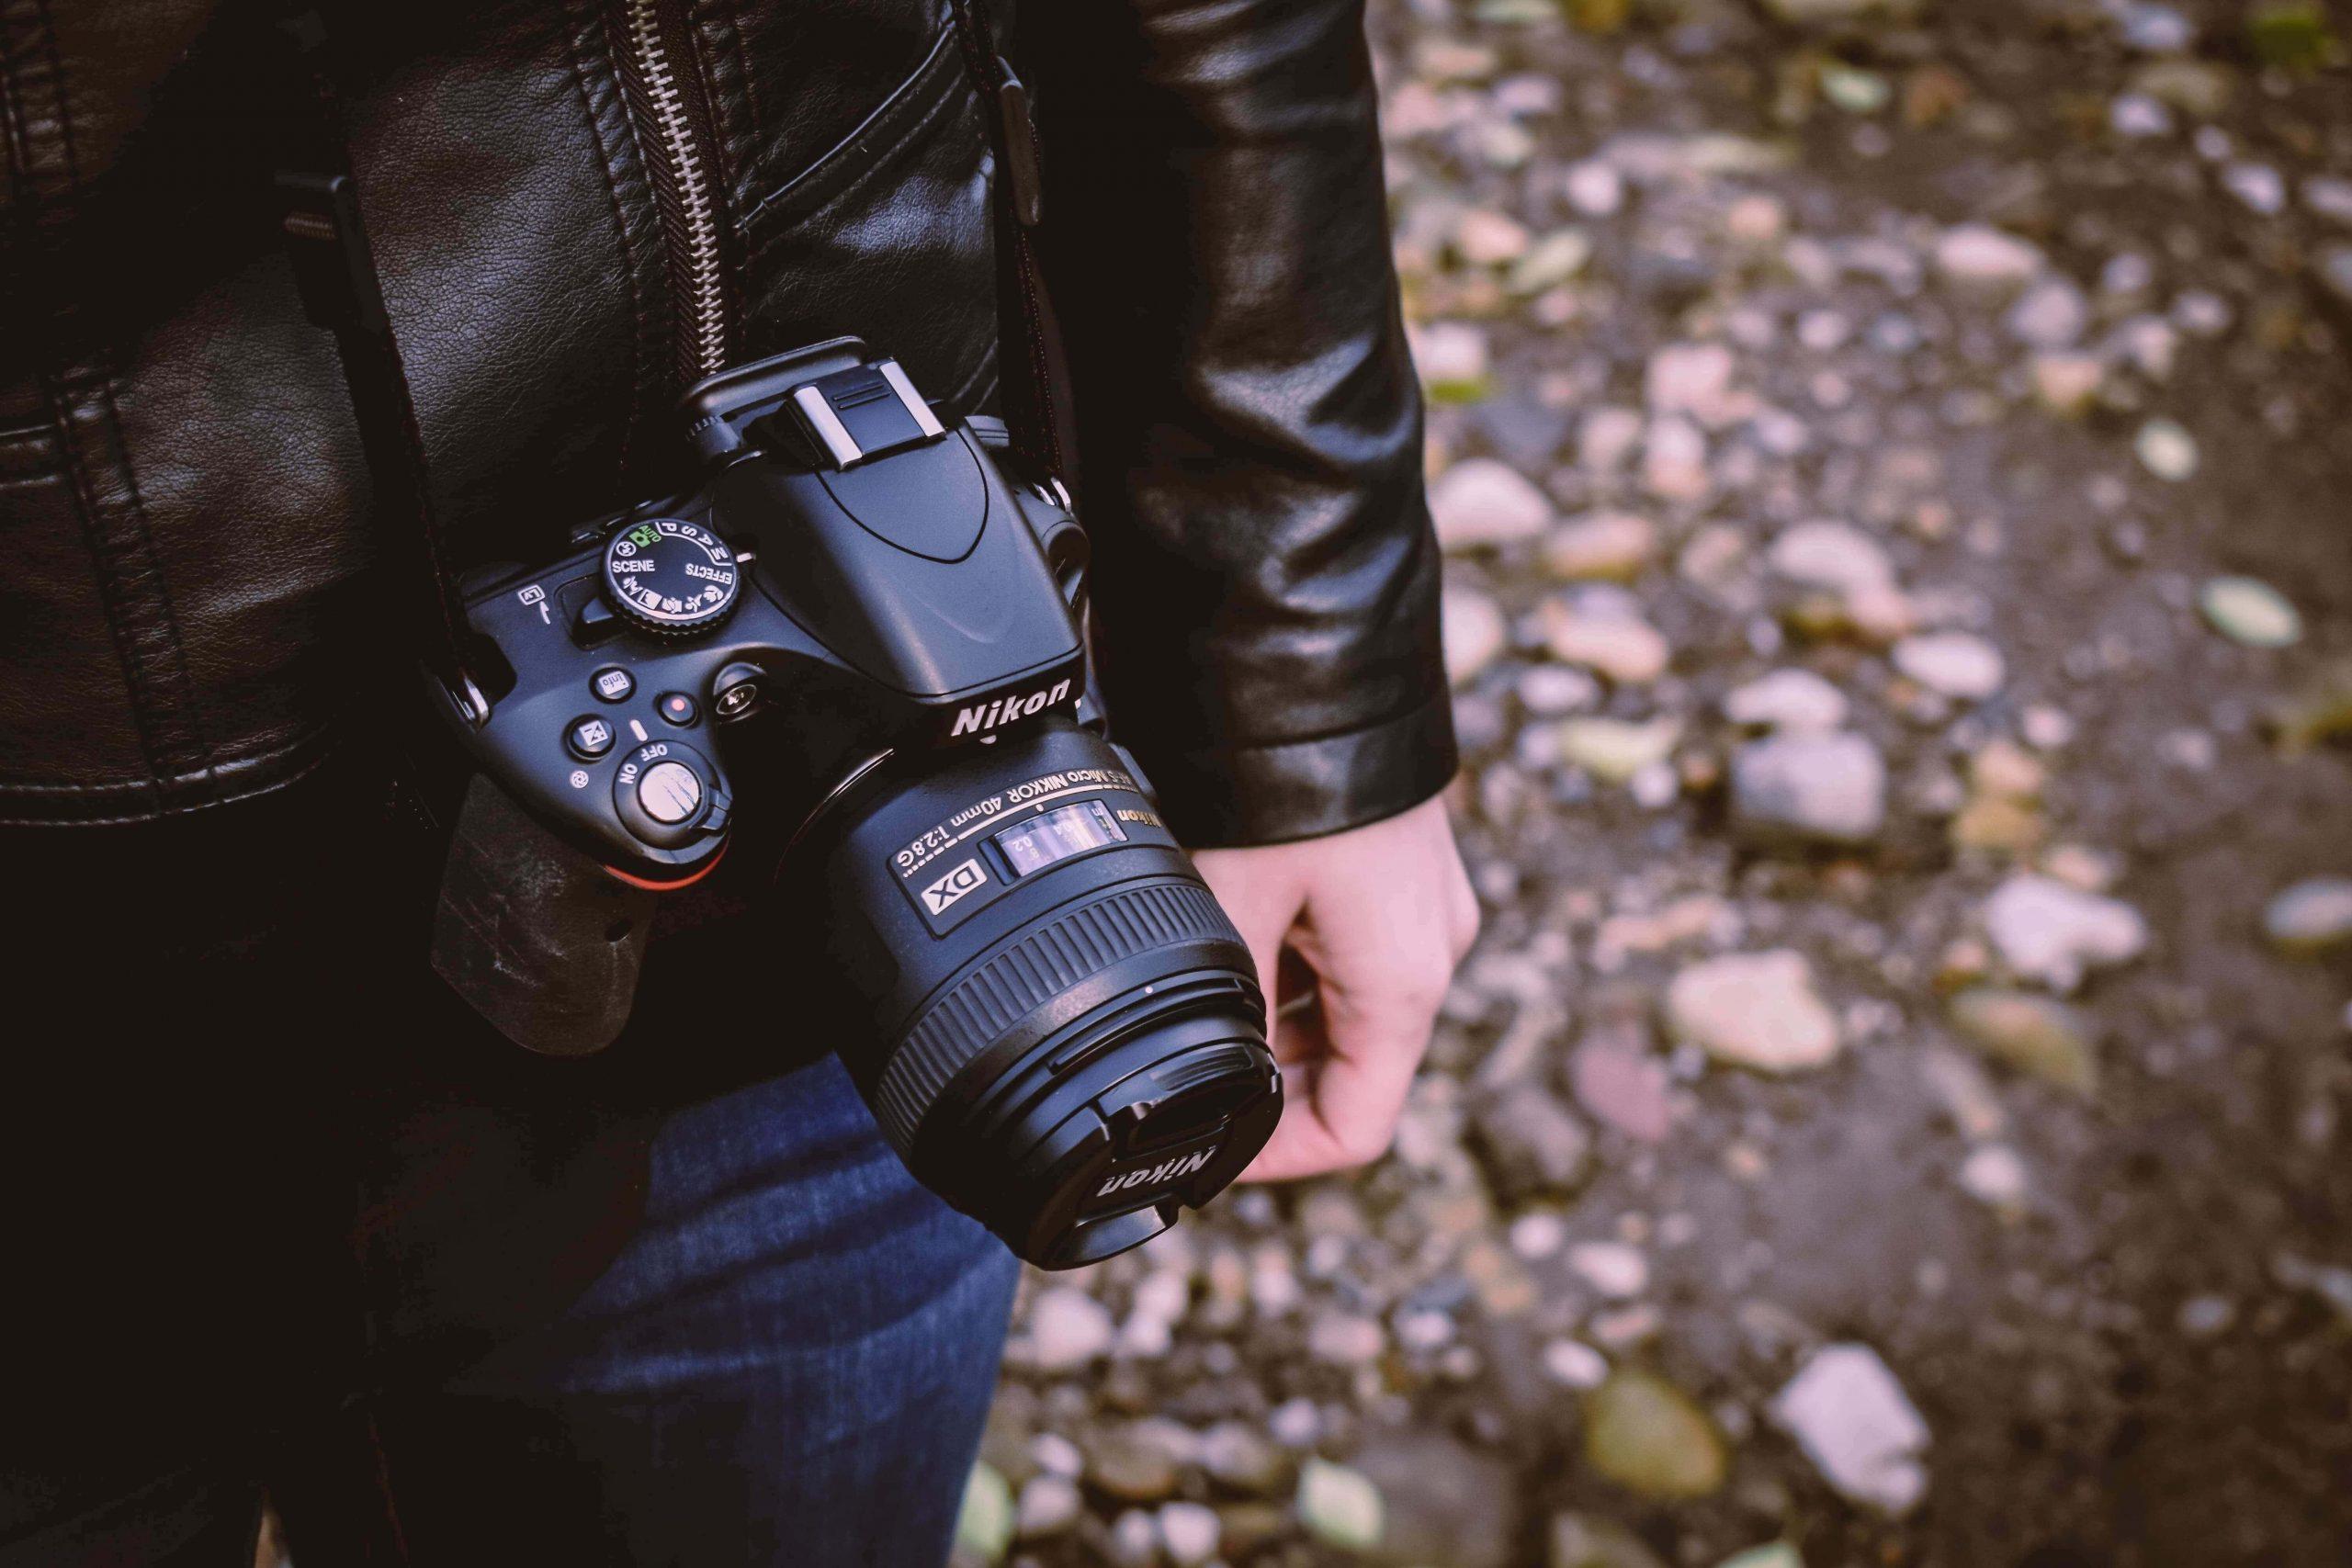 camera-dark-dlsr